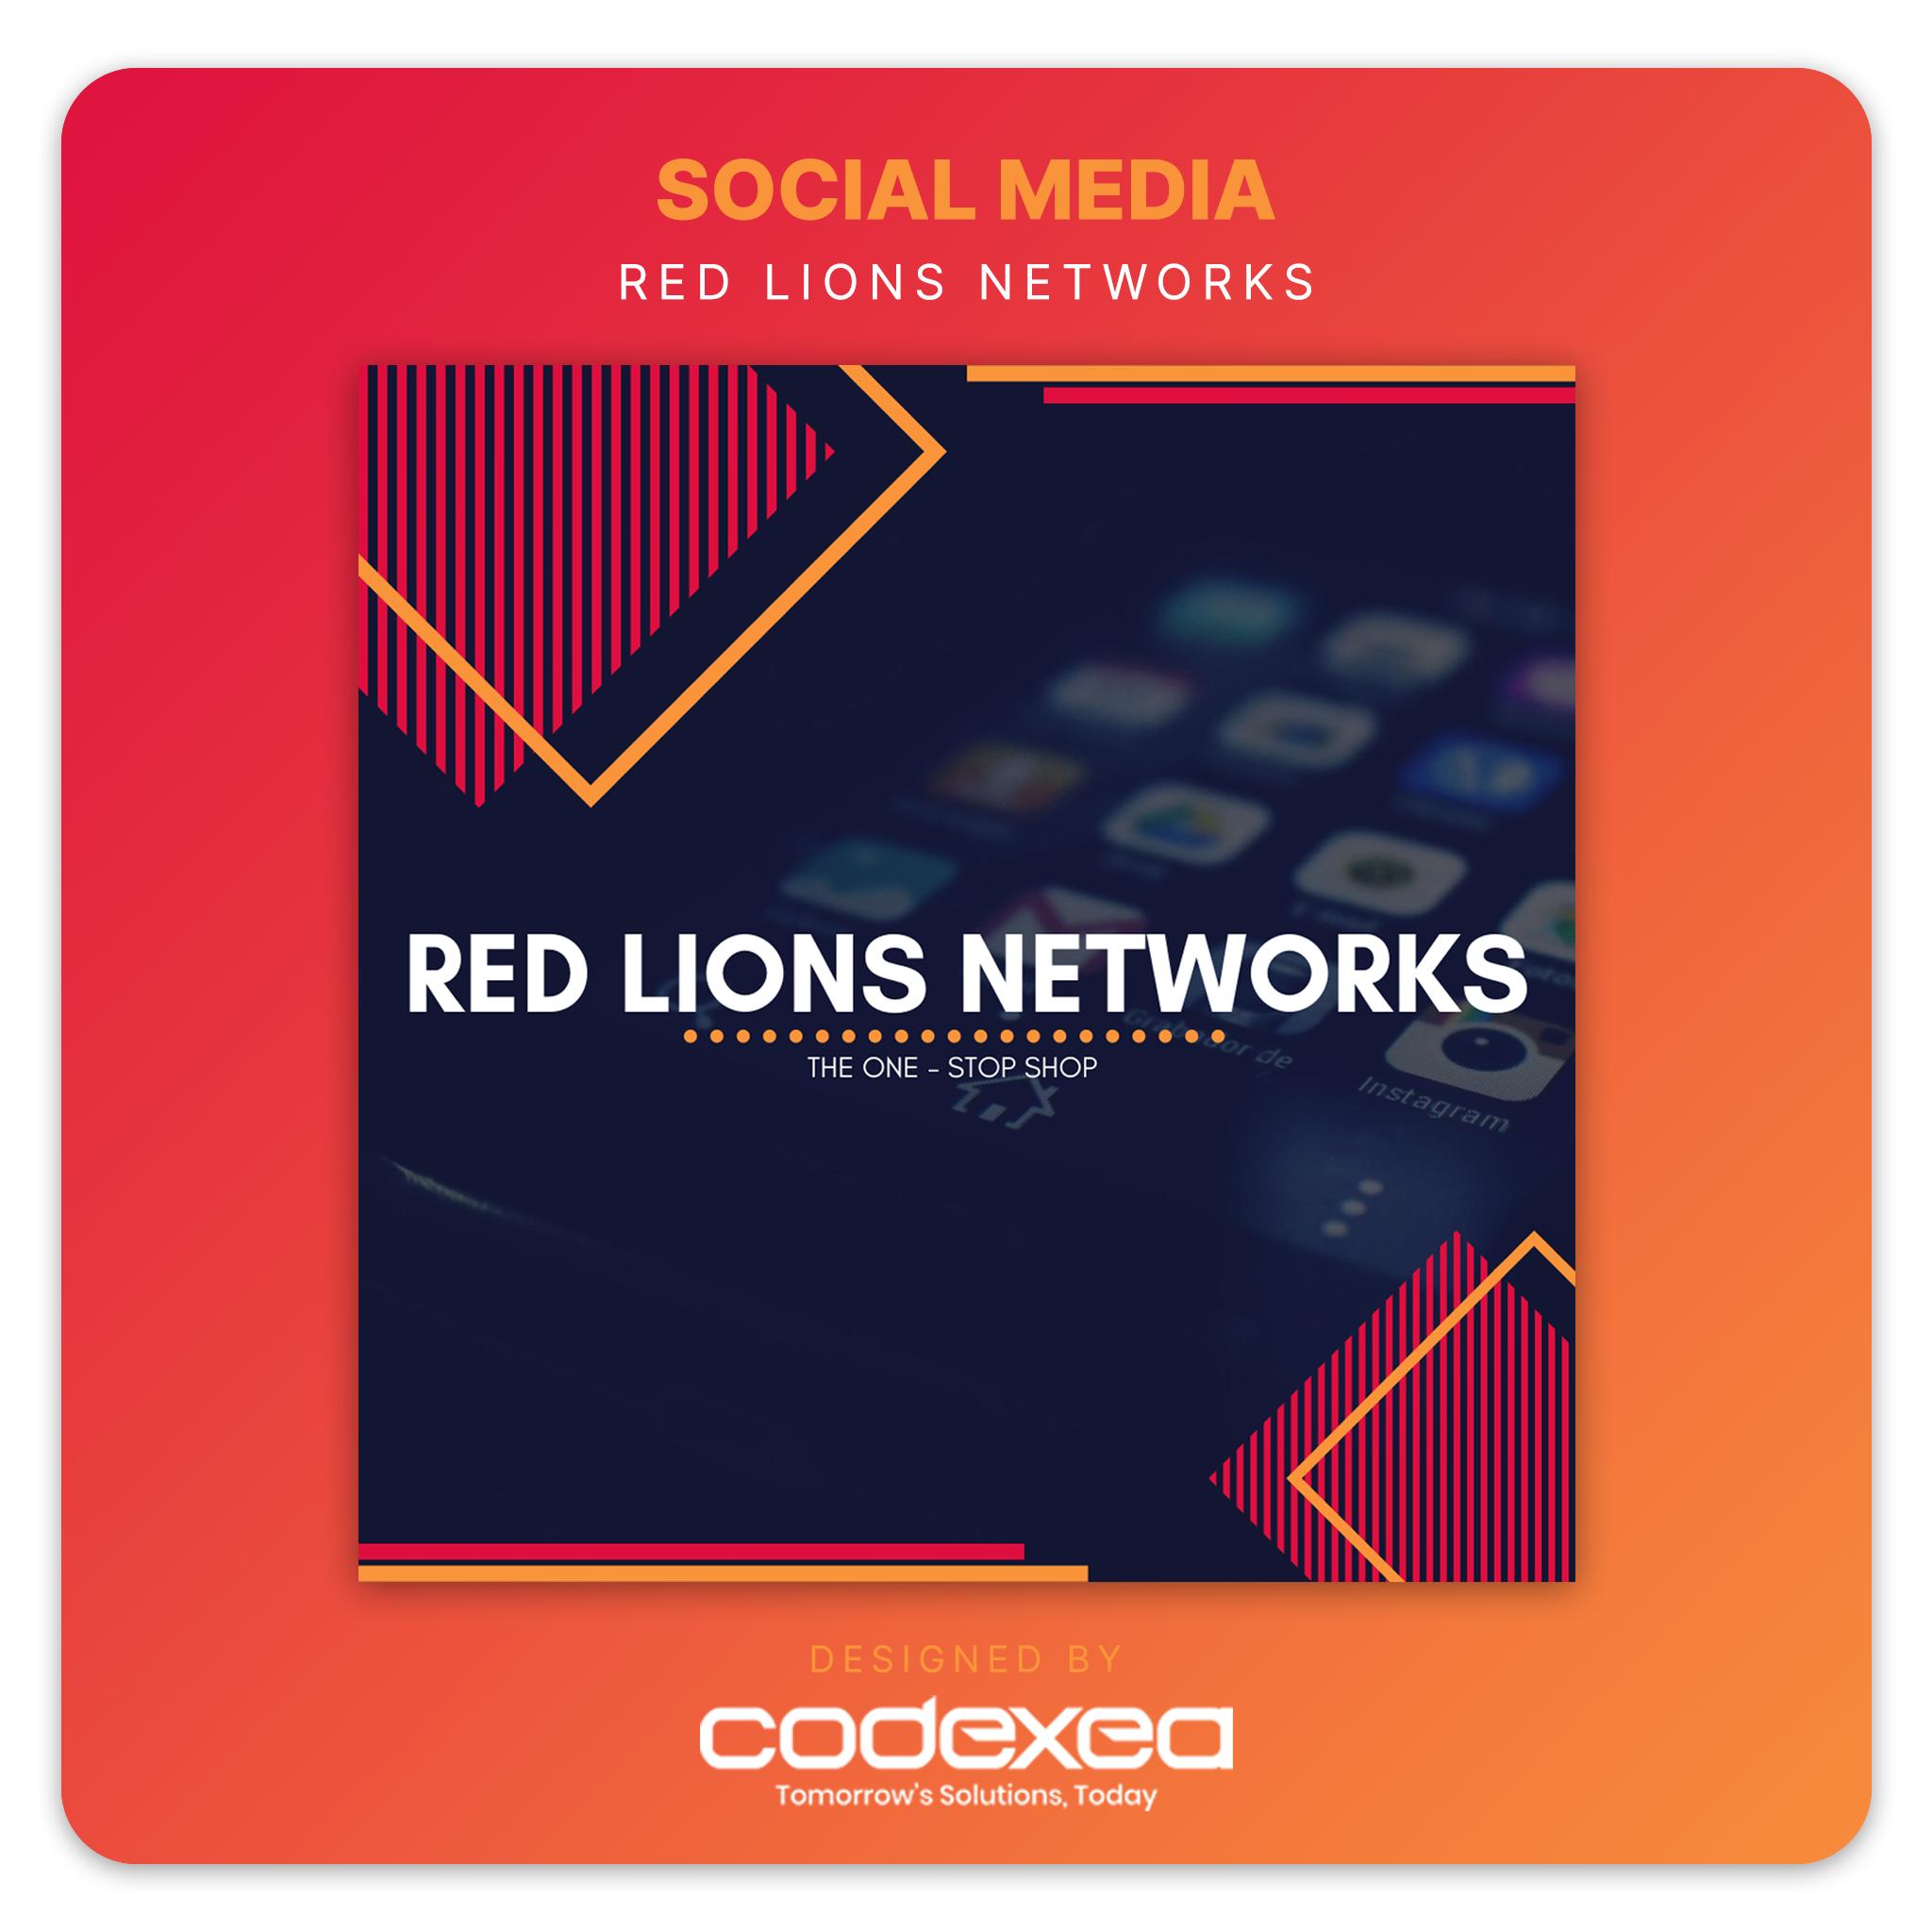 Codexea - #1 Digital Marketing | Best Web Design | Sri Lanka